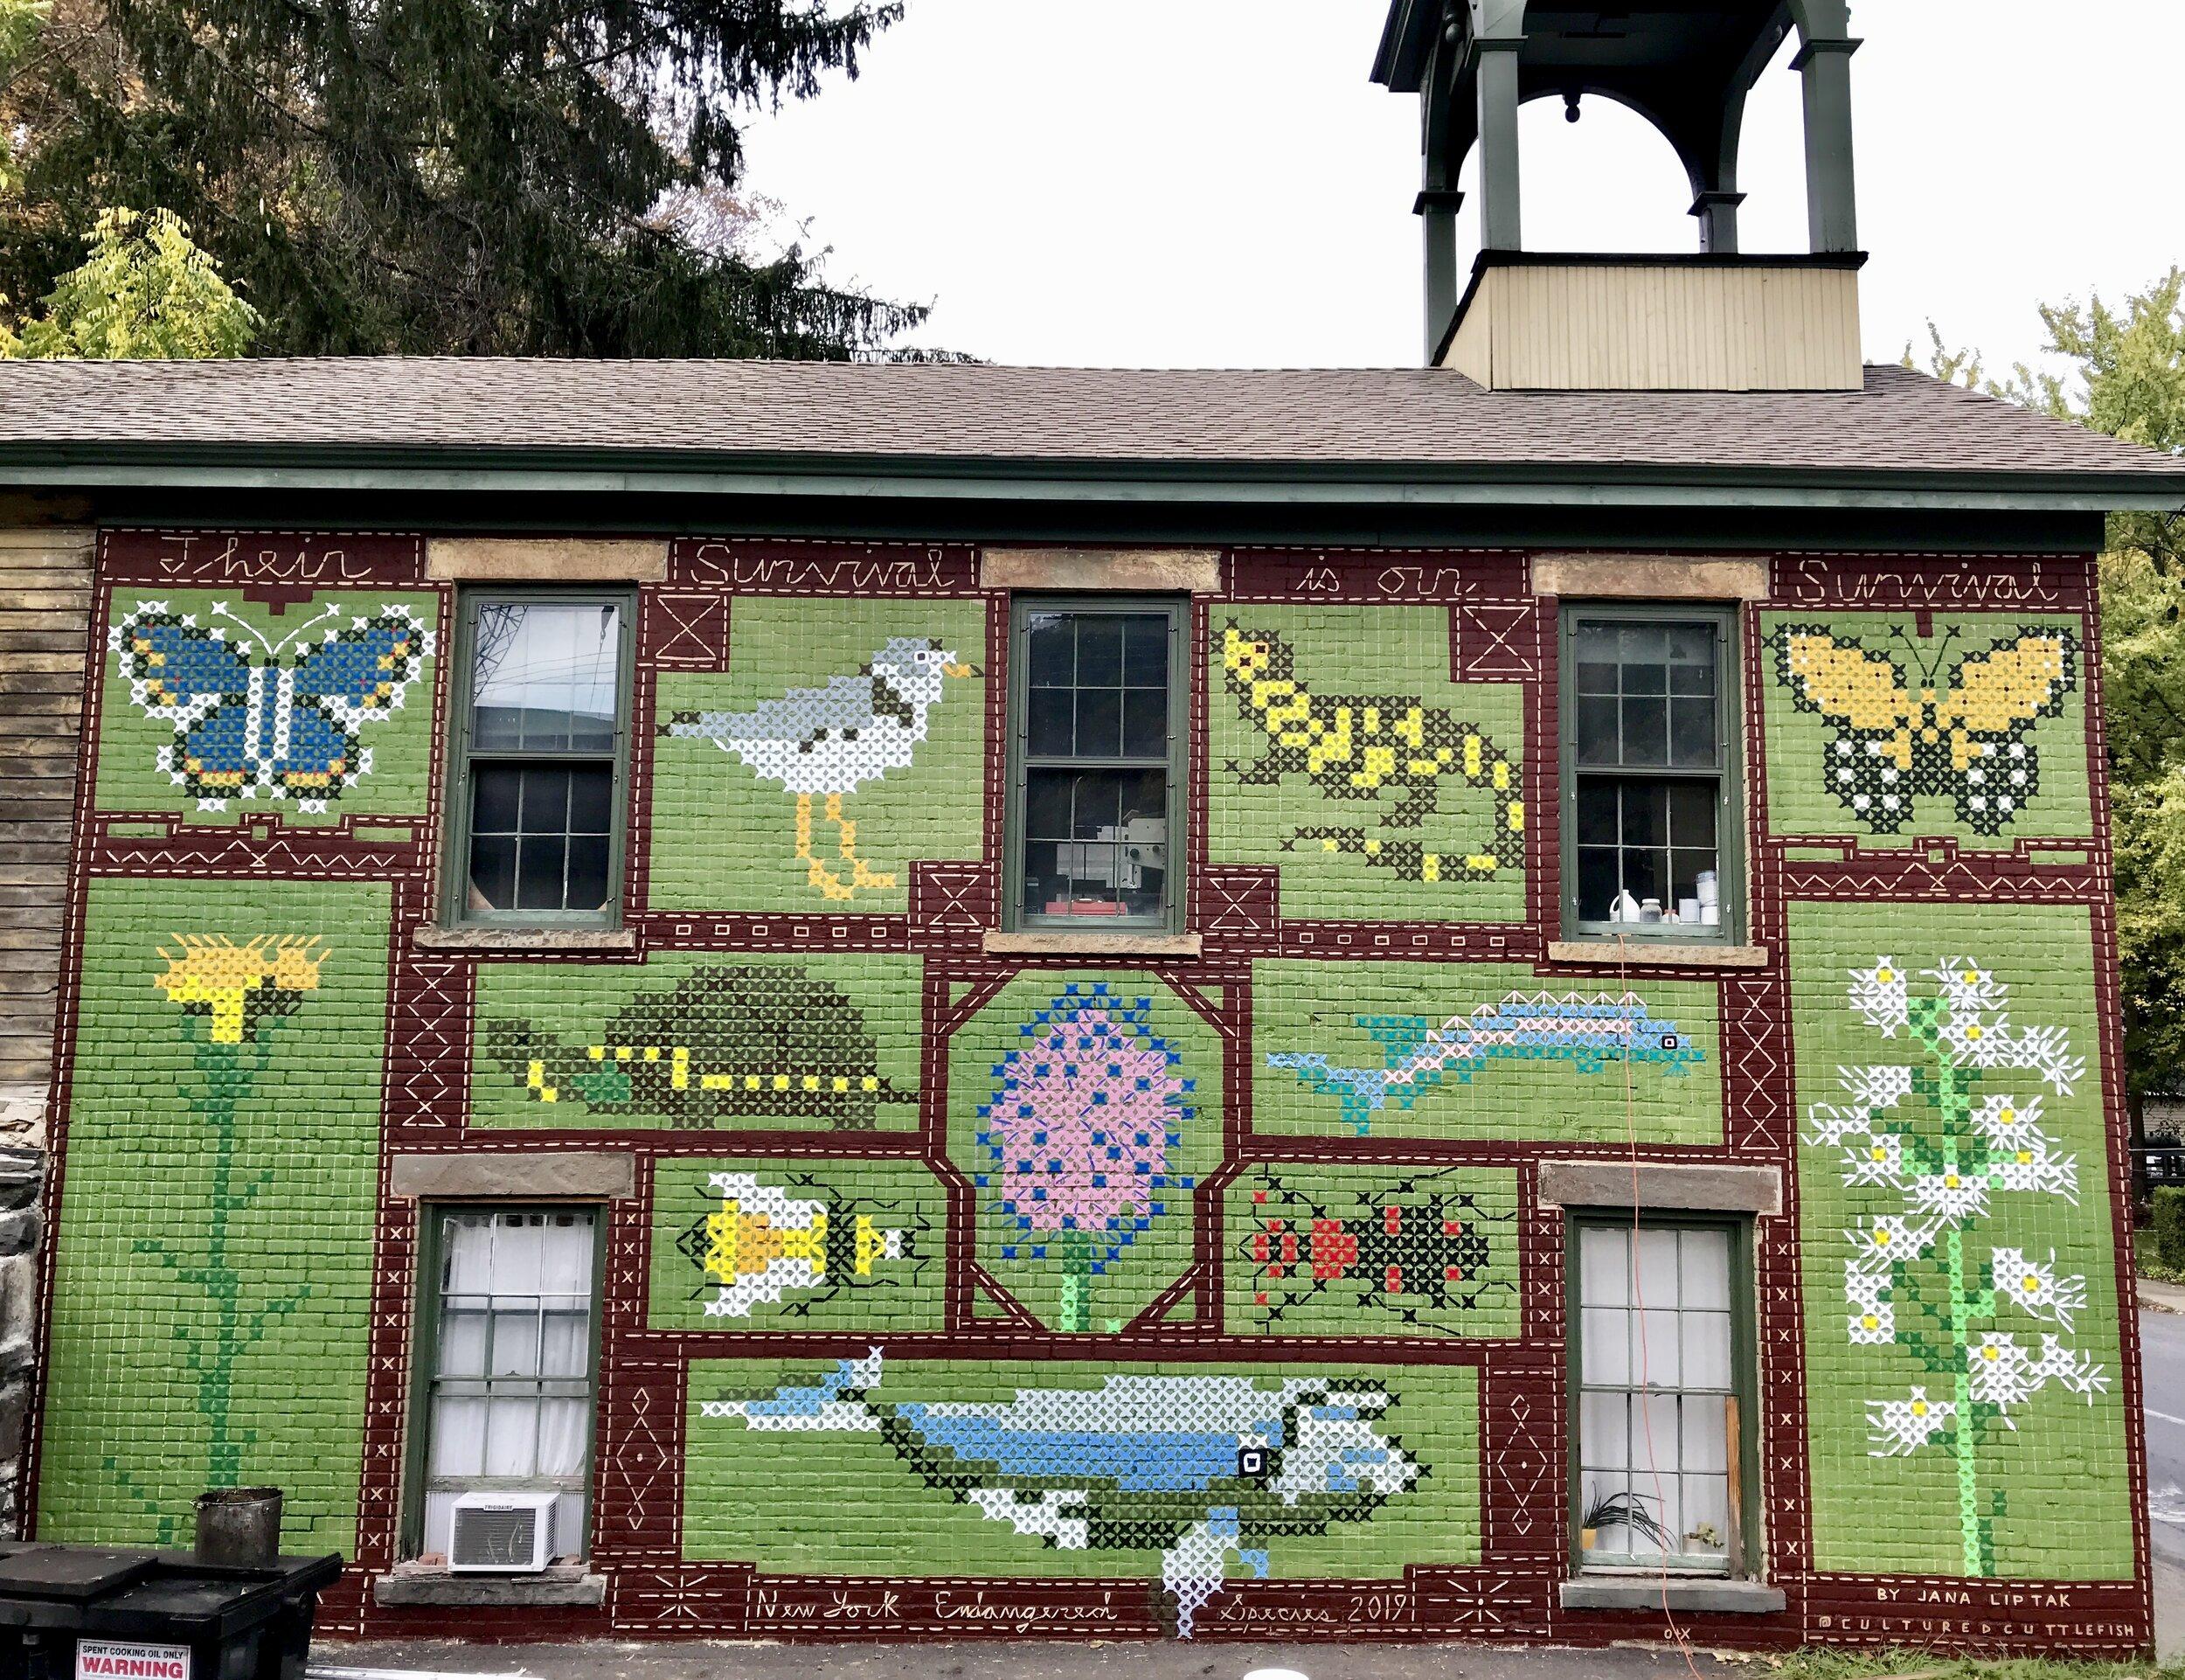 """Their Survival is our Survival,""  O Positive Kingston , 35' x 20', 3 Dunn Street (Old Twalfskill Firehouse), Kingston, NY 2019"